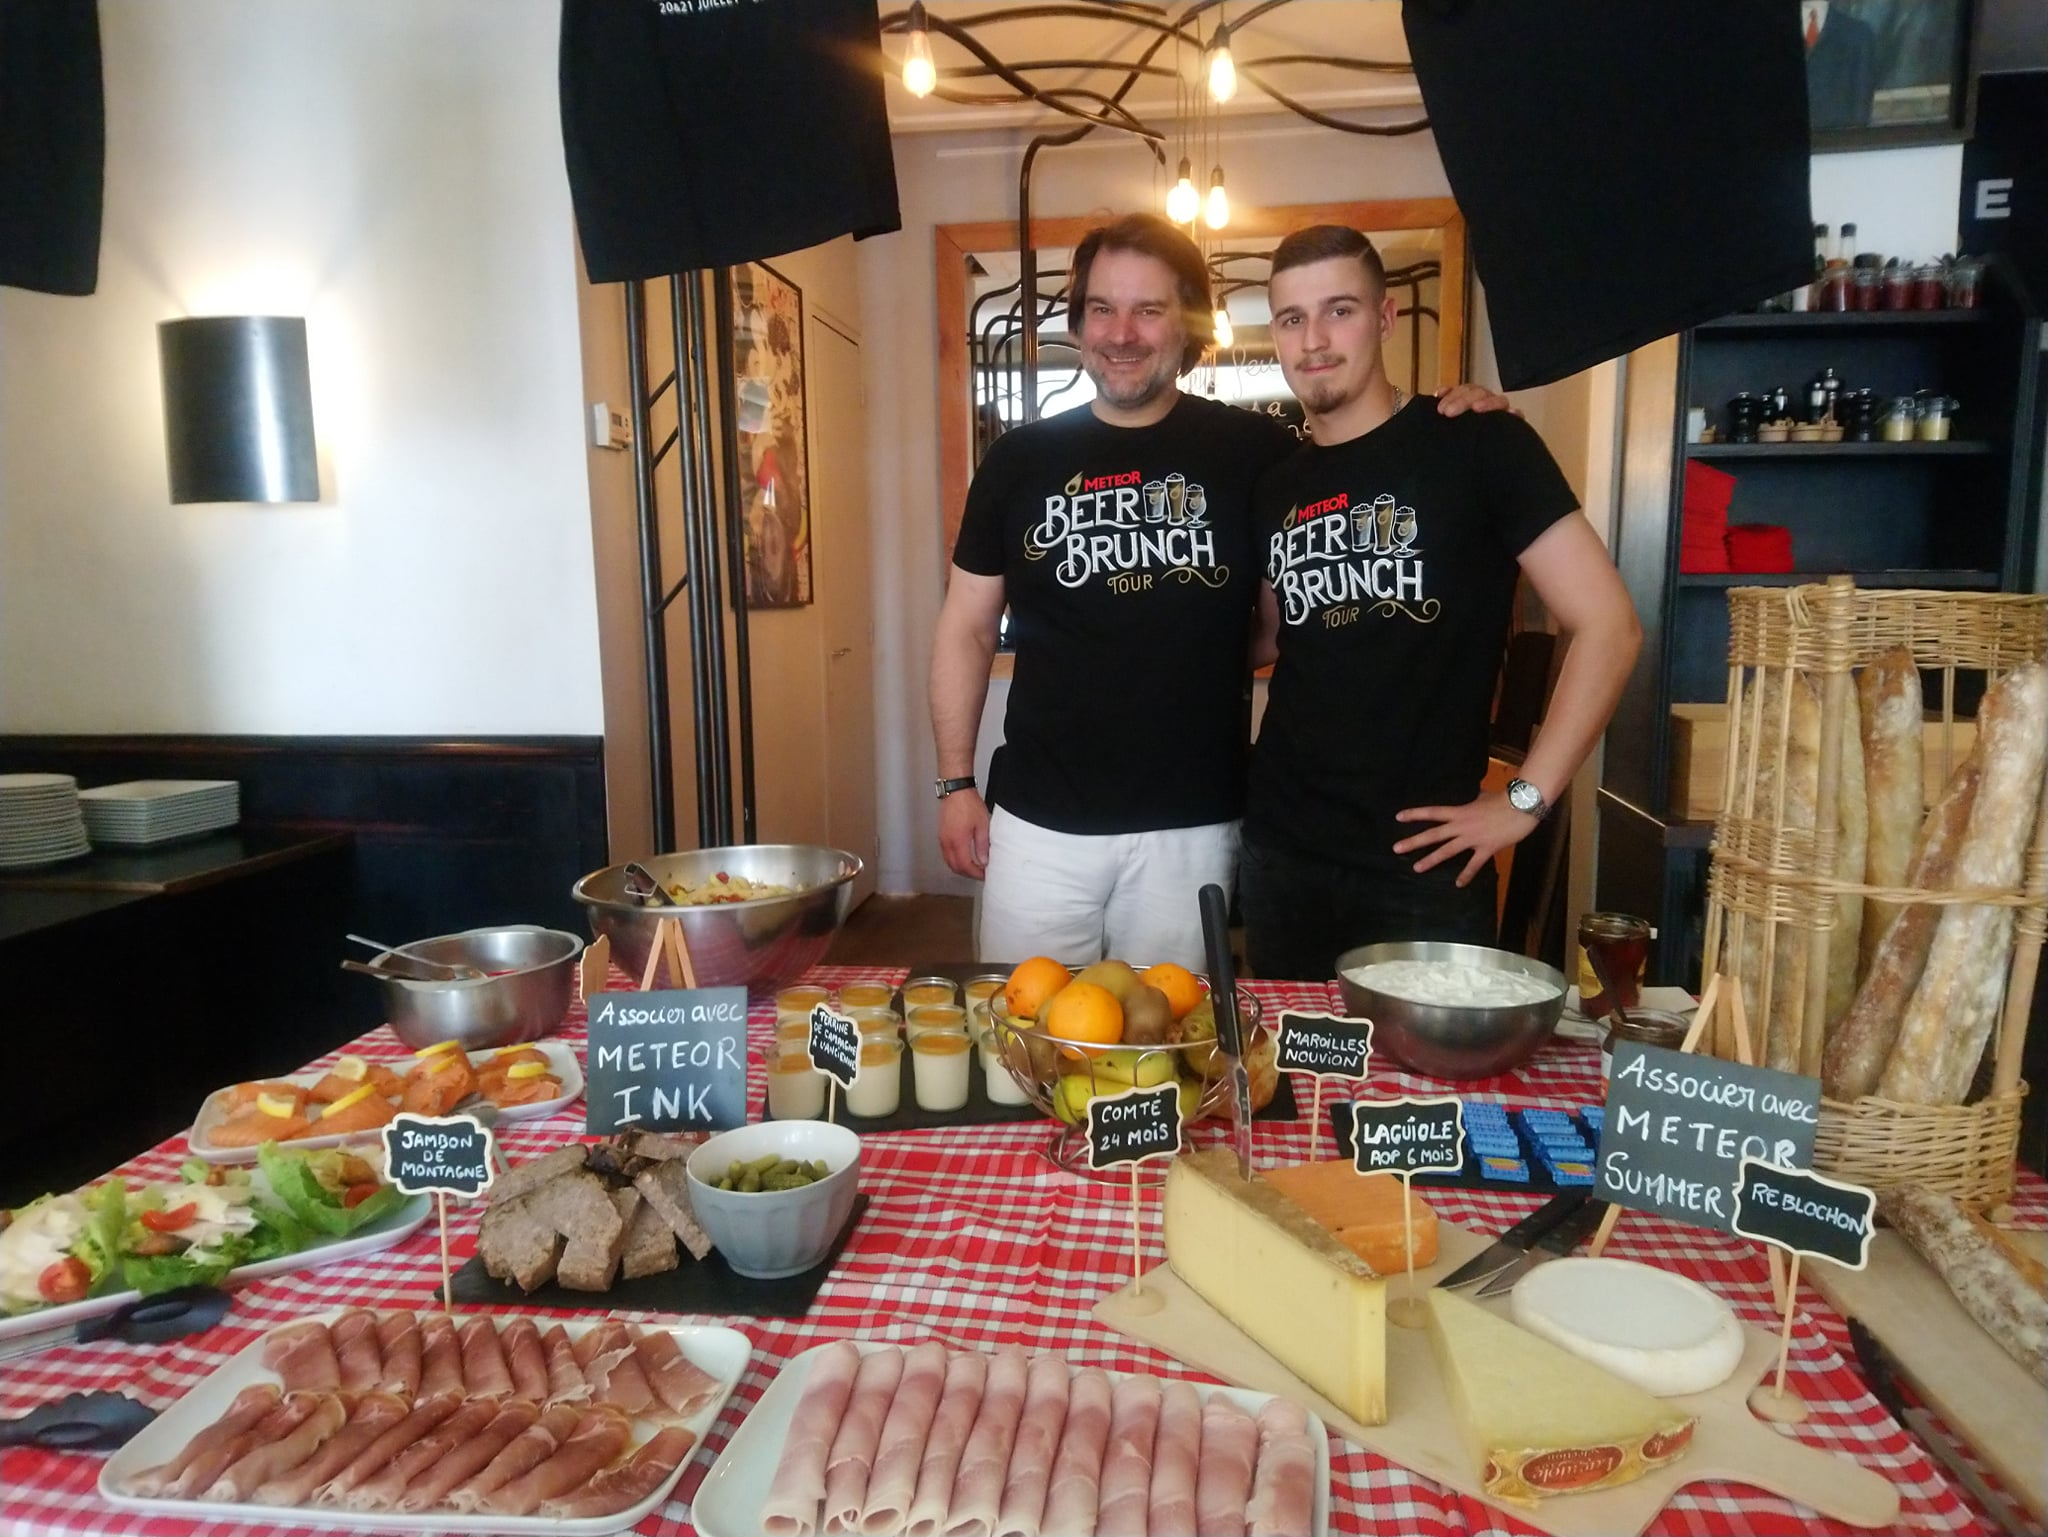 Brasserie Meteor - Beer brunch tour - Bière et food pairing - Mathieu Pfauwadel